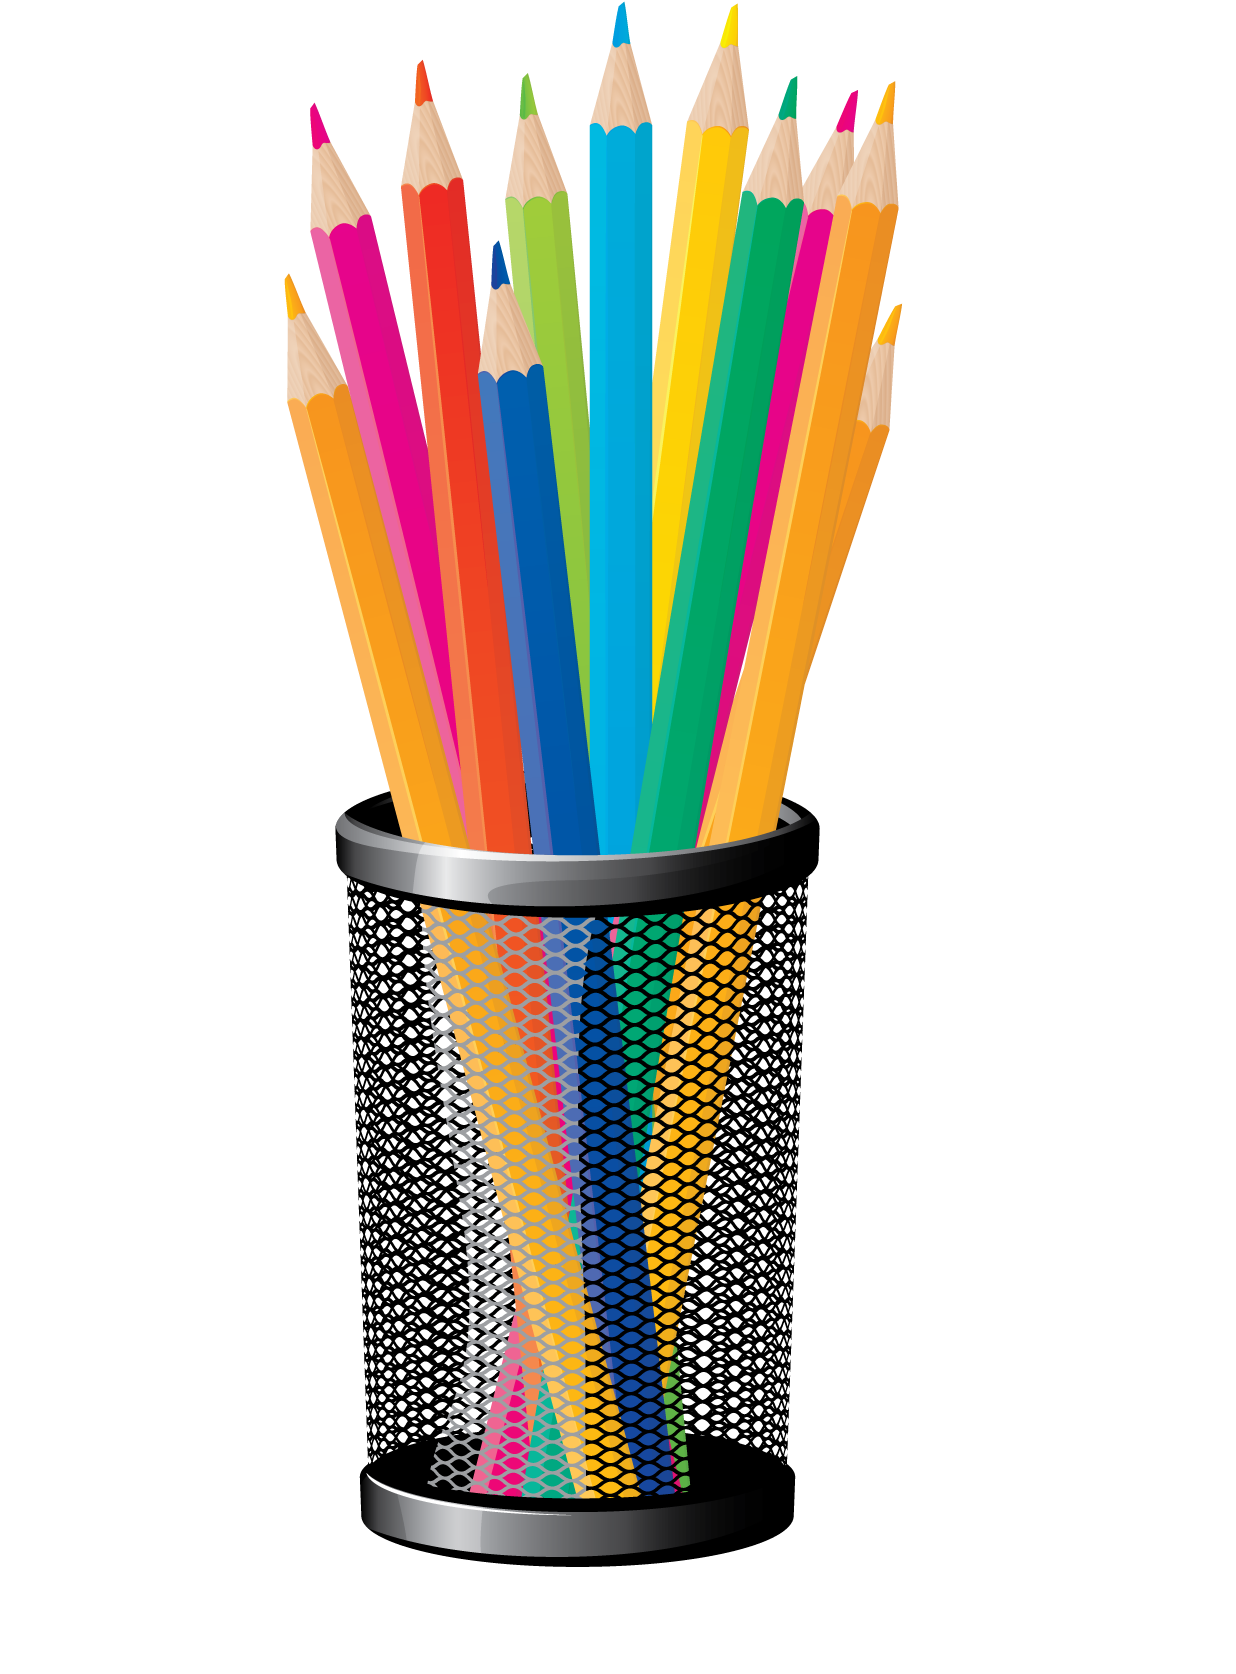 Free pencil clipart clip art images and 4 - Clipartix